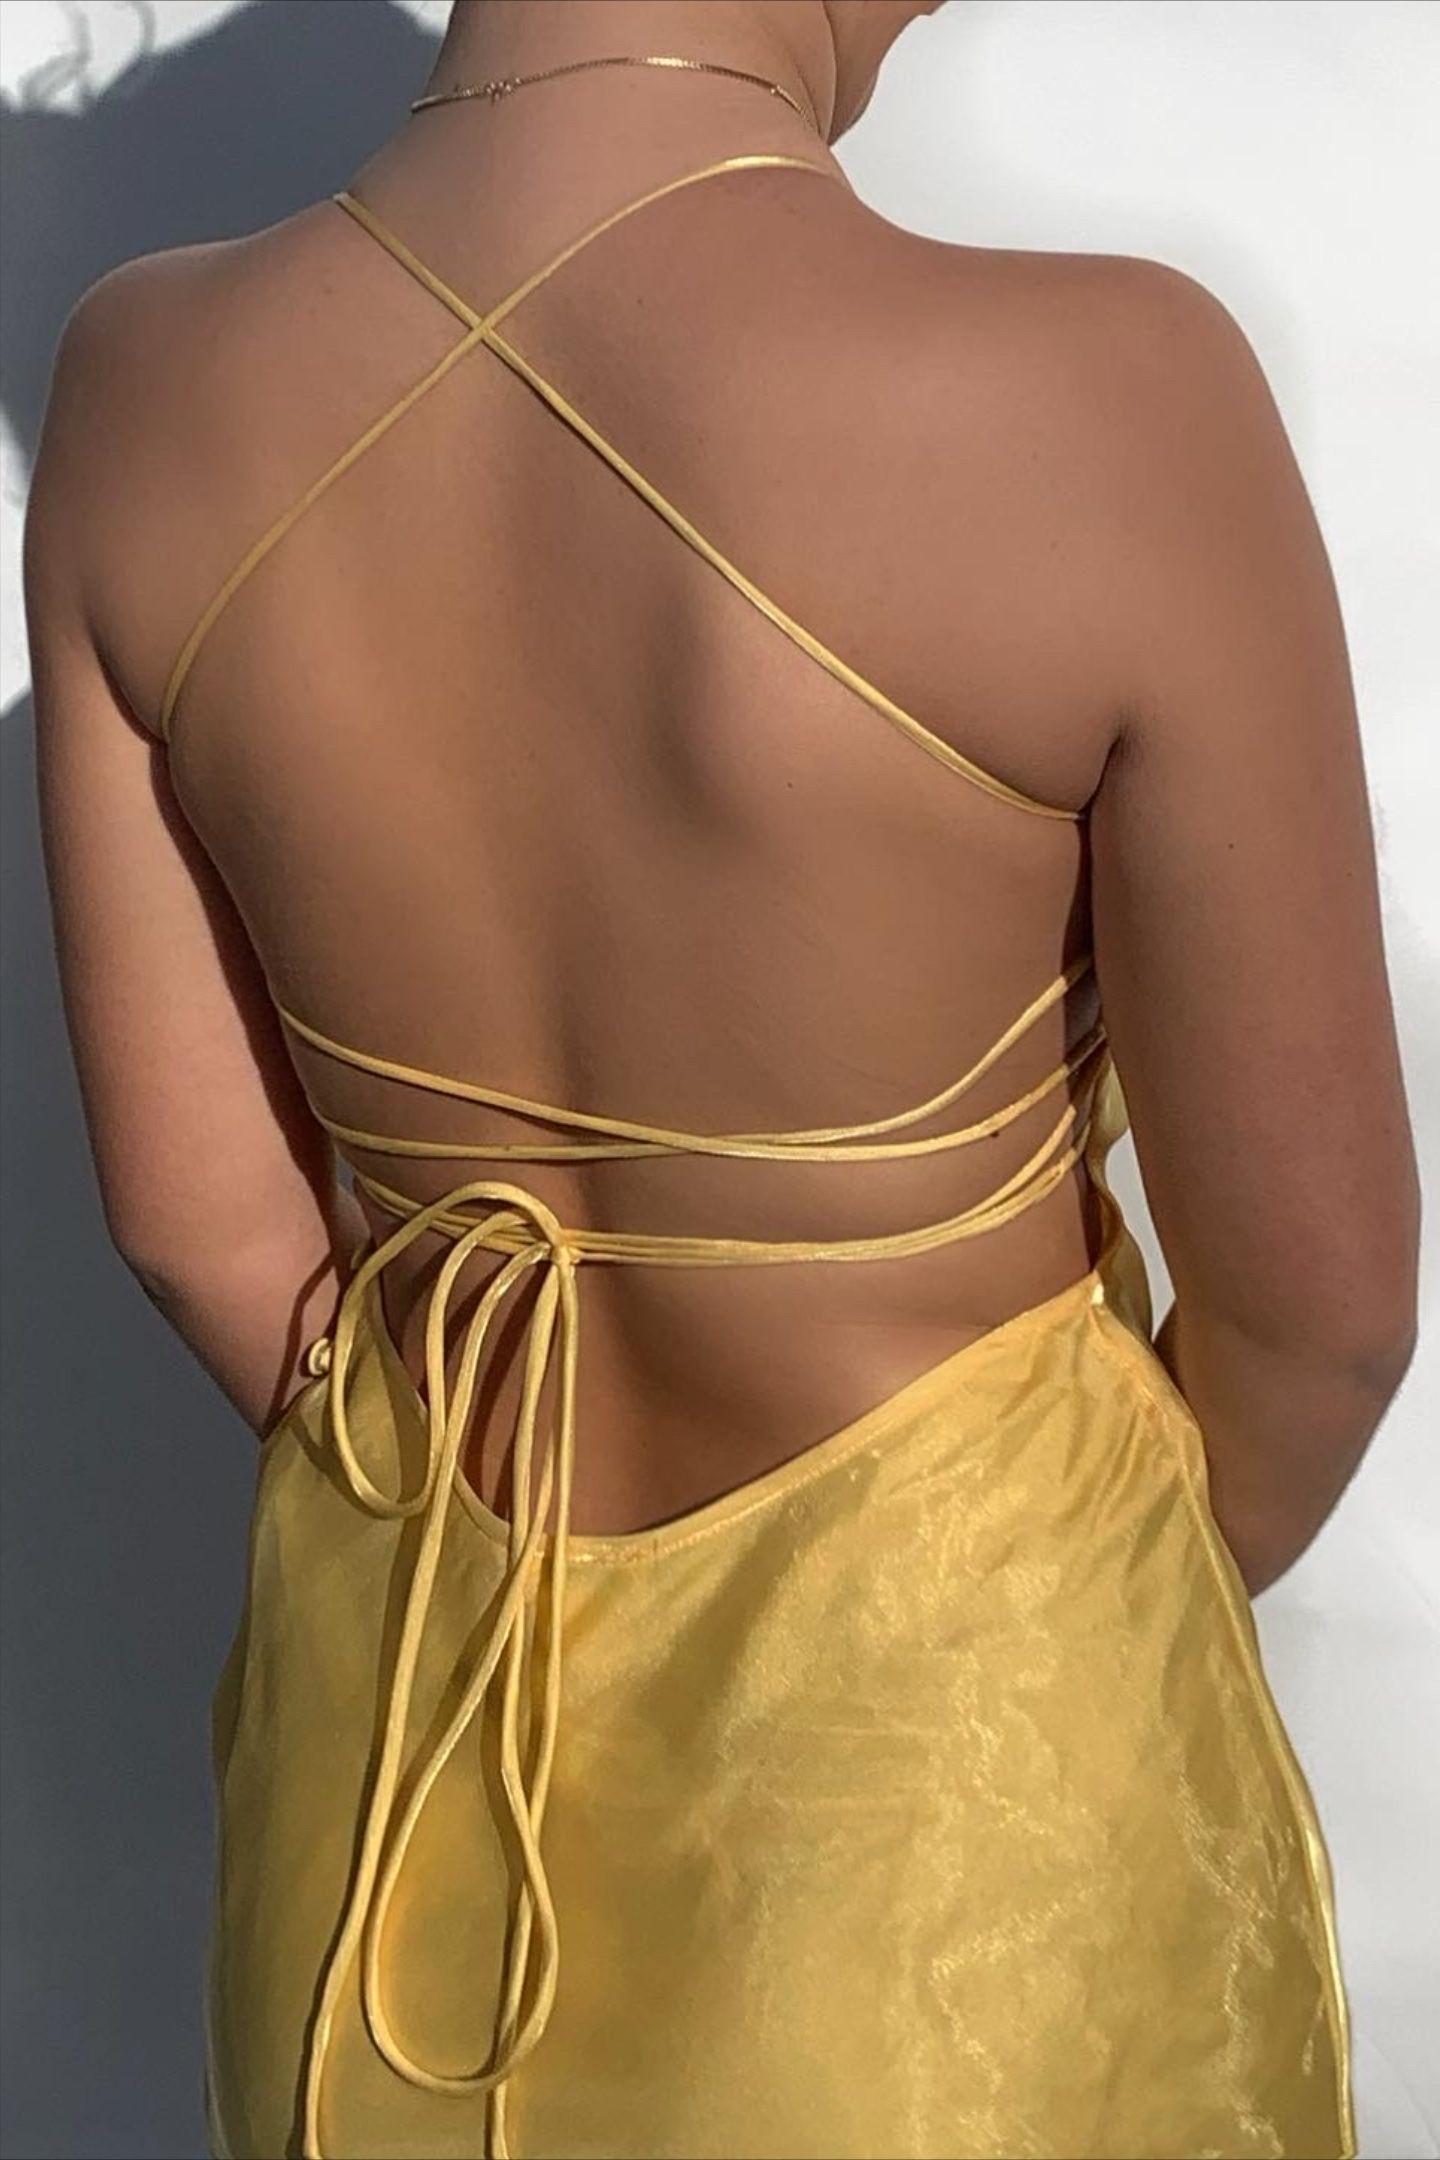 Formal Dress Prom Formal Dresses Prom Formal Dresses 90s Formal Dress [ 2160 x 1440 Pixel ]